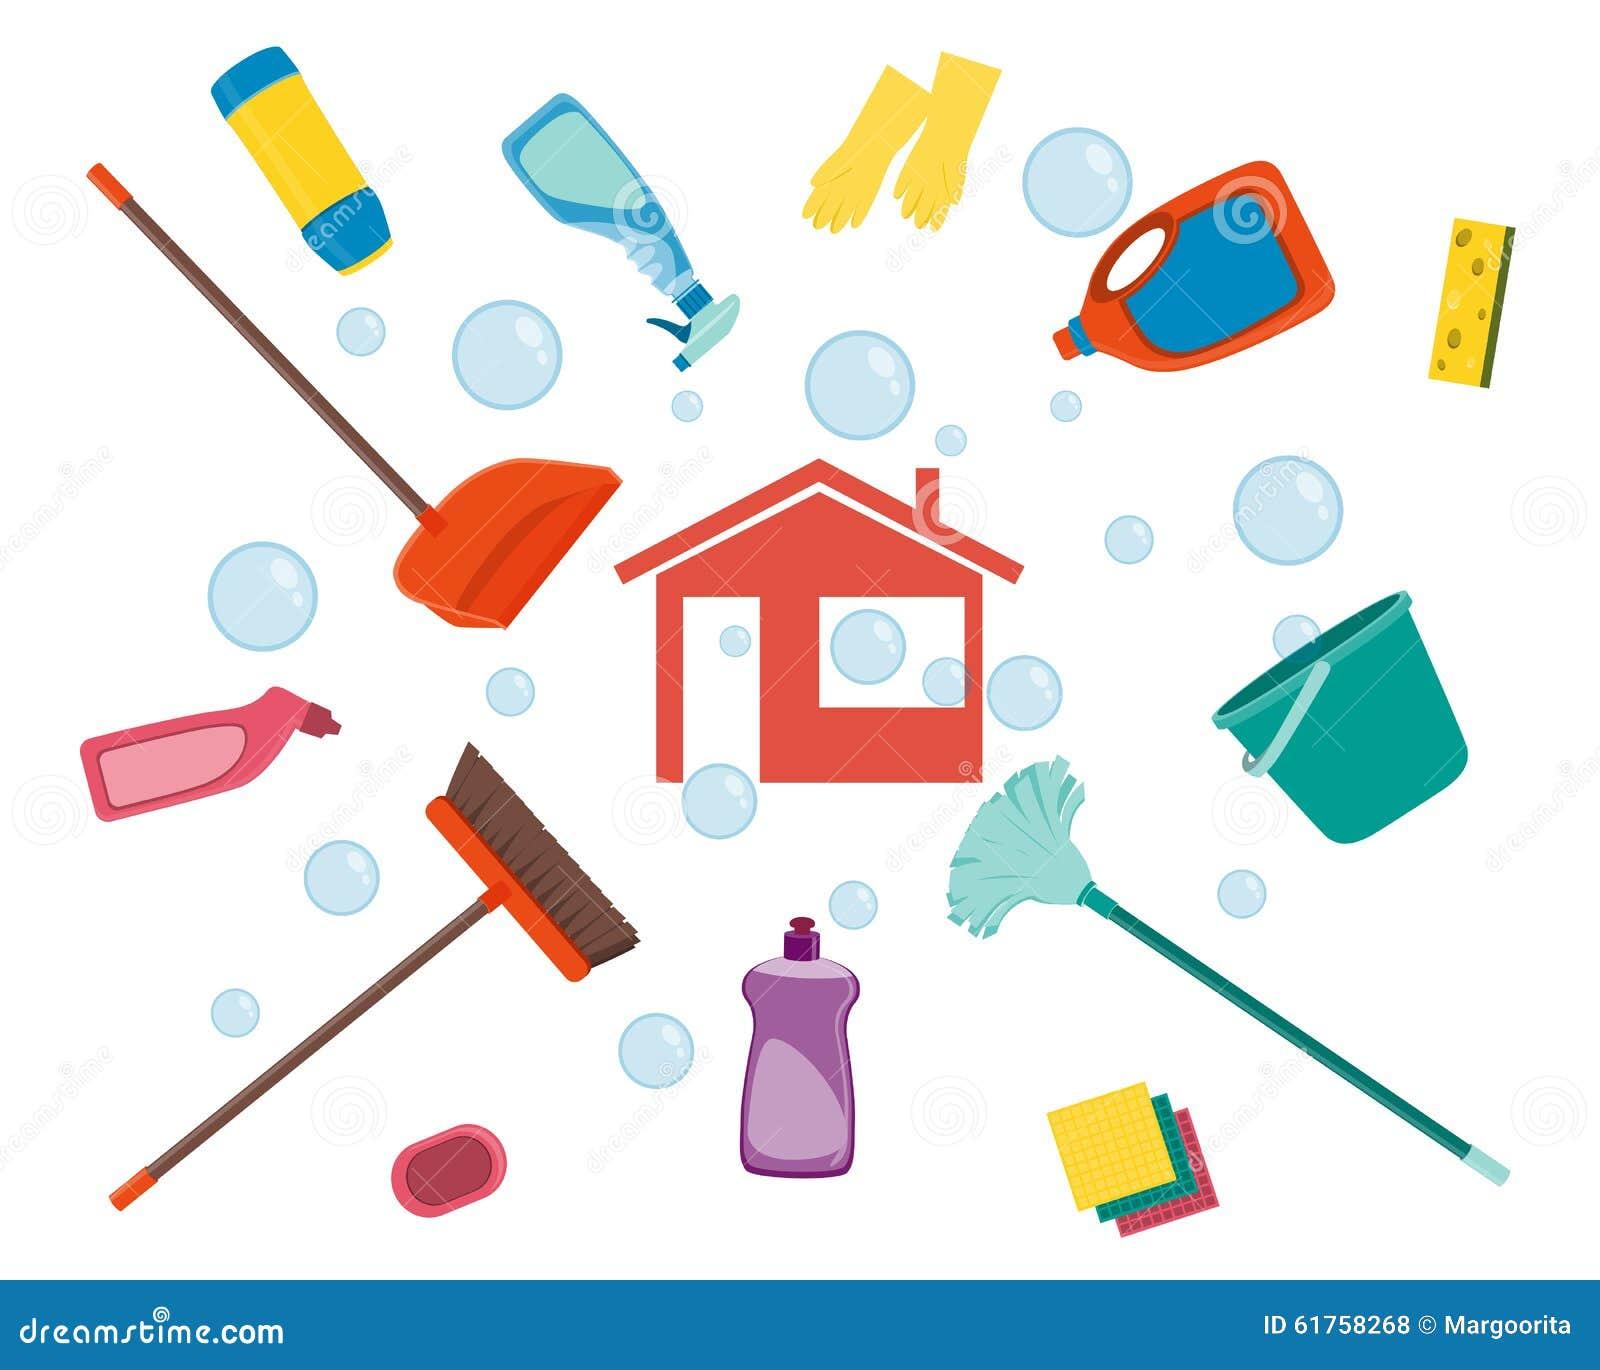 House cleaning stock vector illustration of industry - Imagenes de limpieza de casas ...